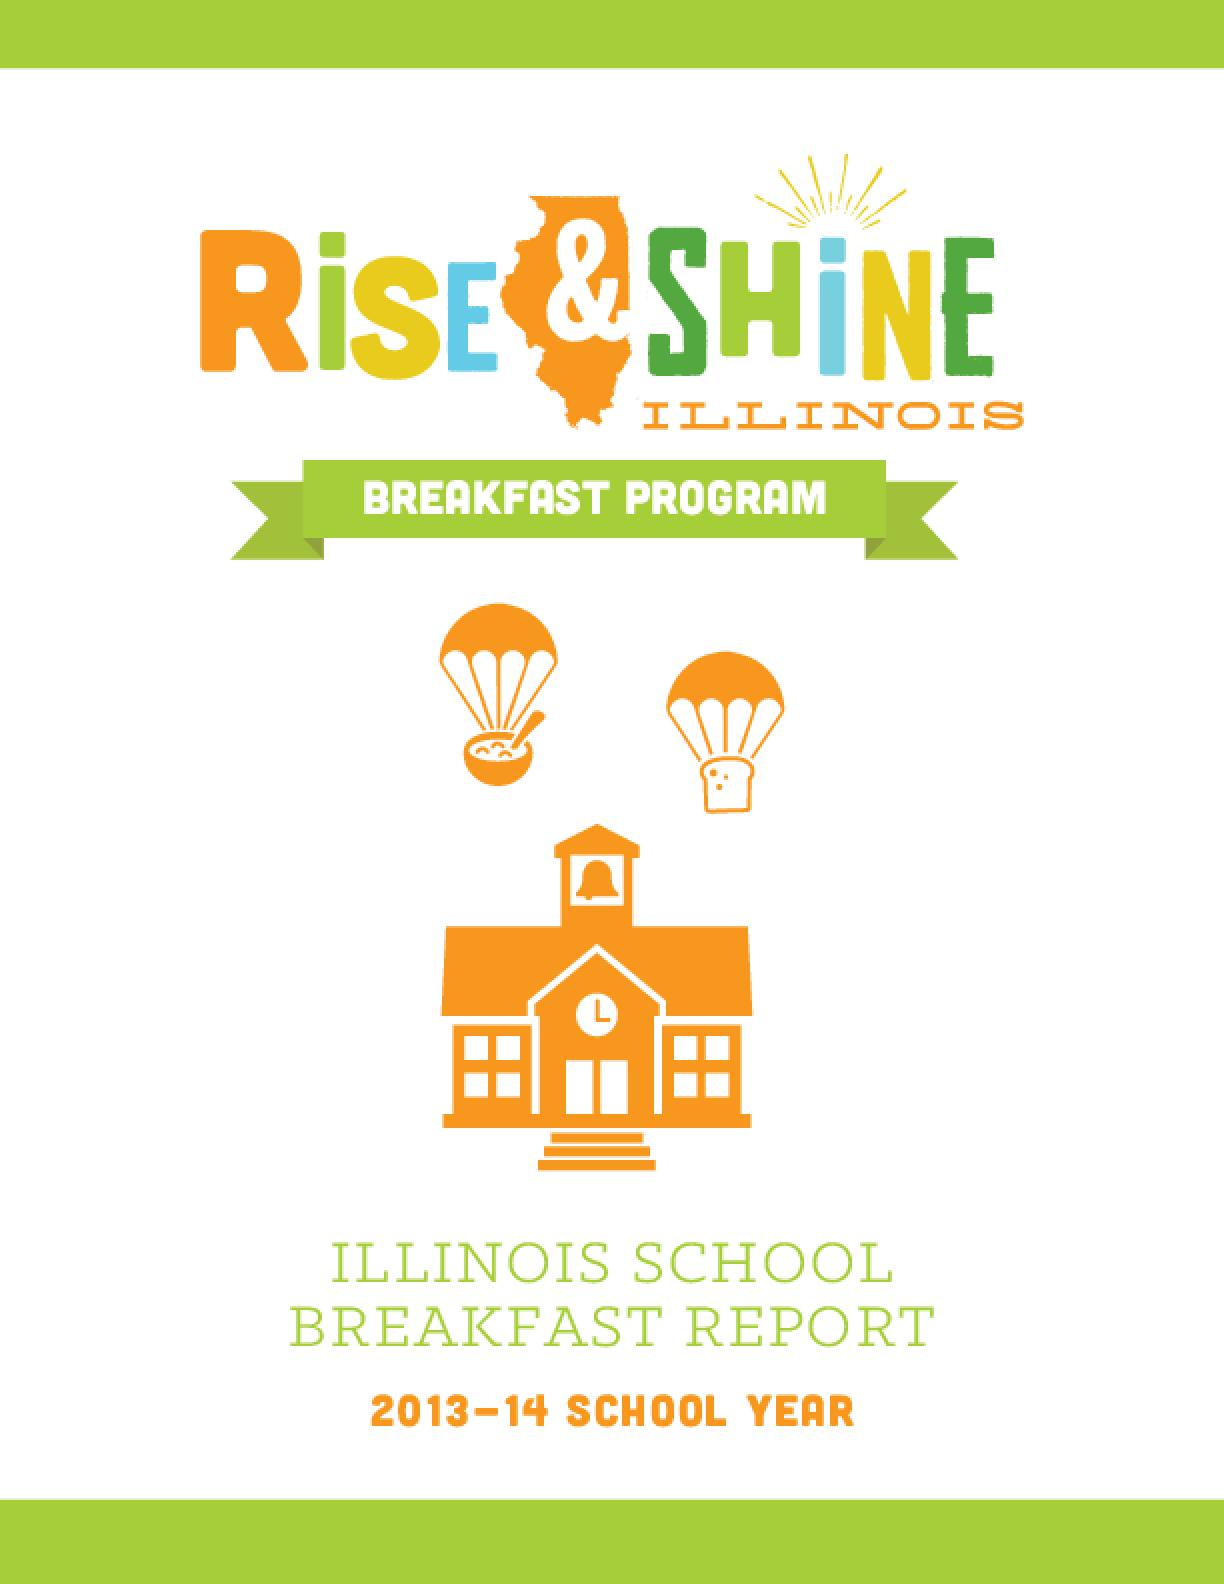 Illinois School Breakfast Report 2013-14 School Year